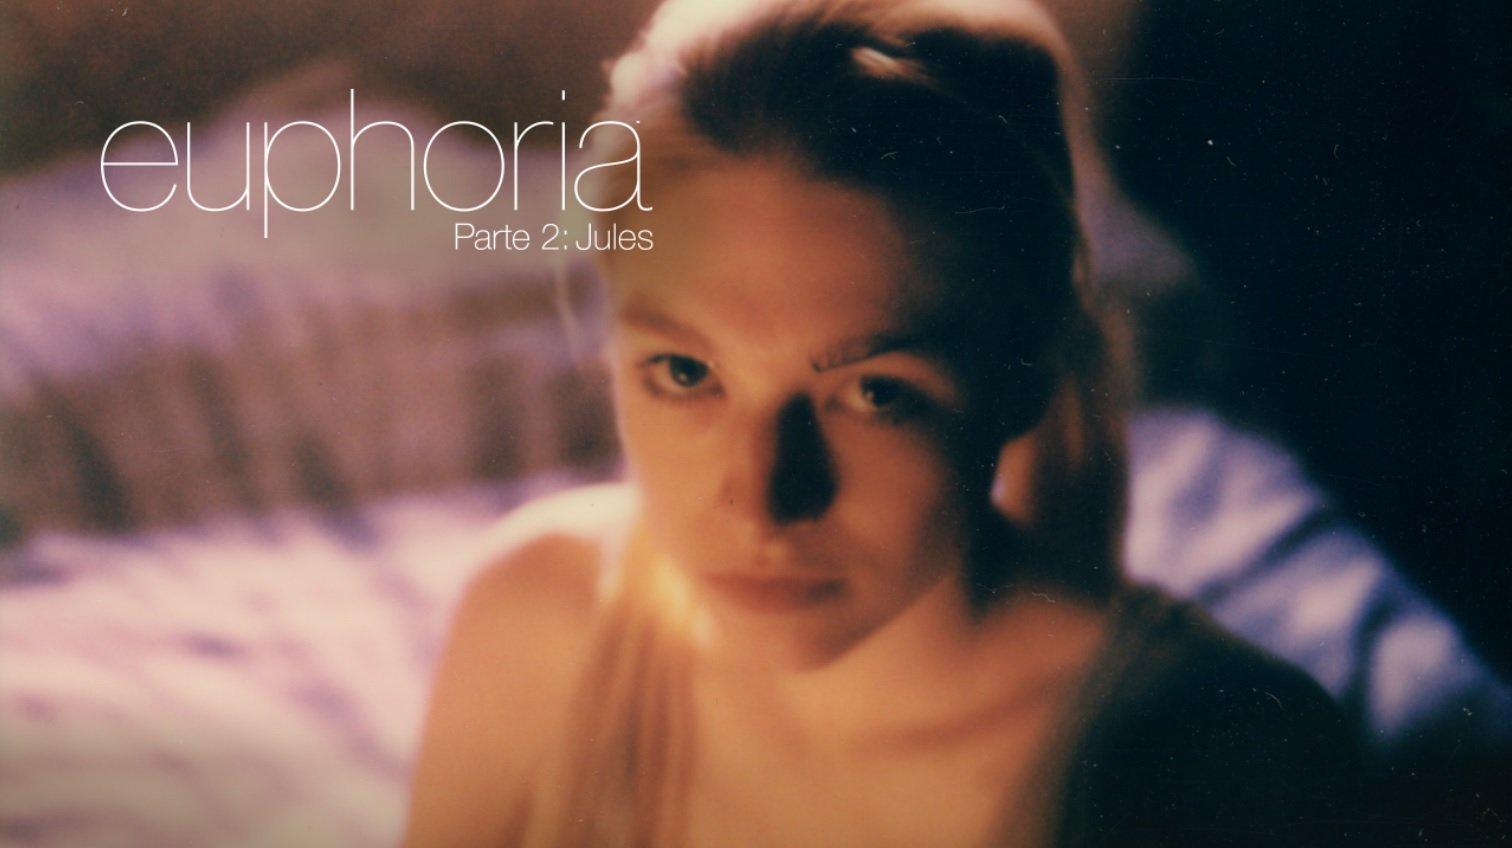 Euphoria, secondo episodio speciale su Sky Atlantic in contemporanea HBO